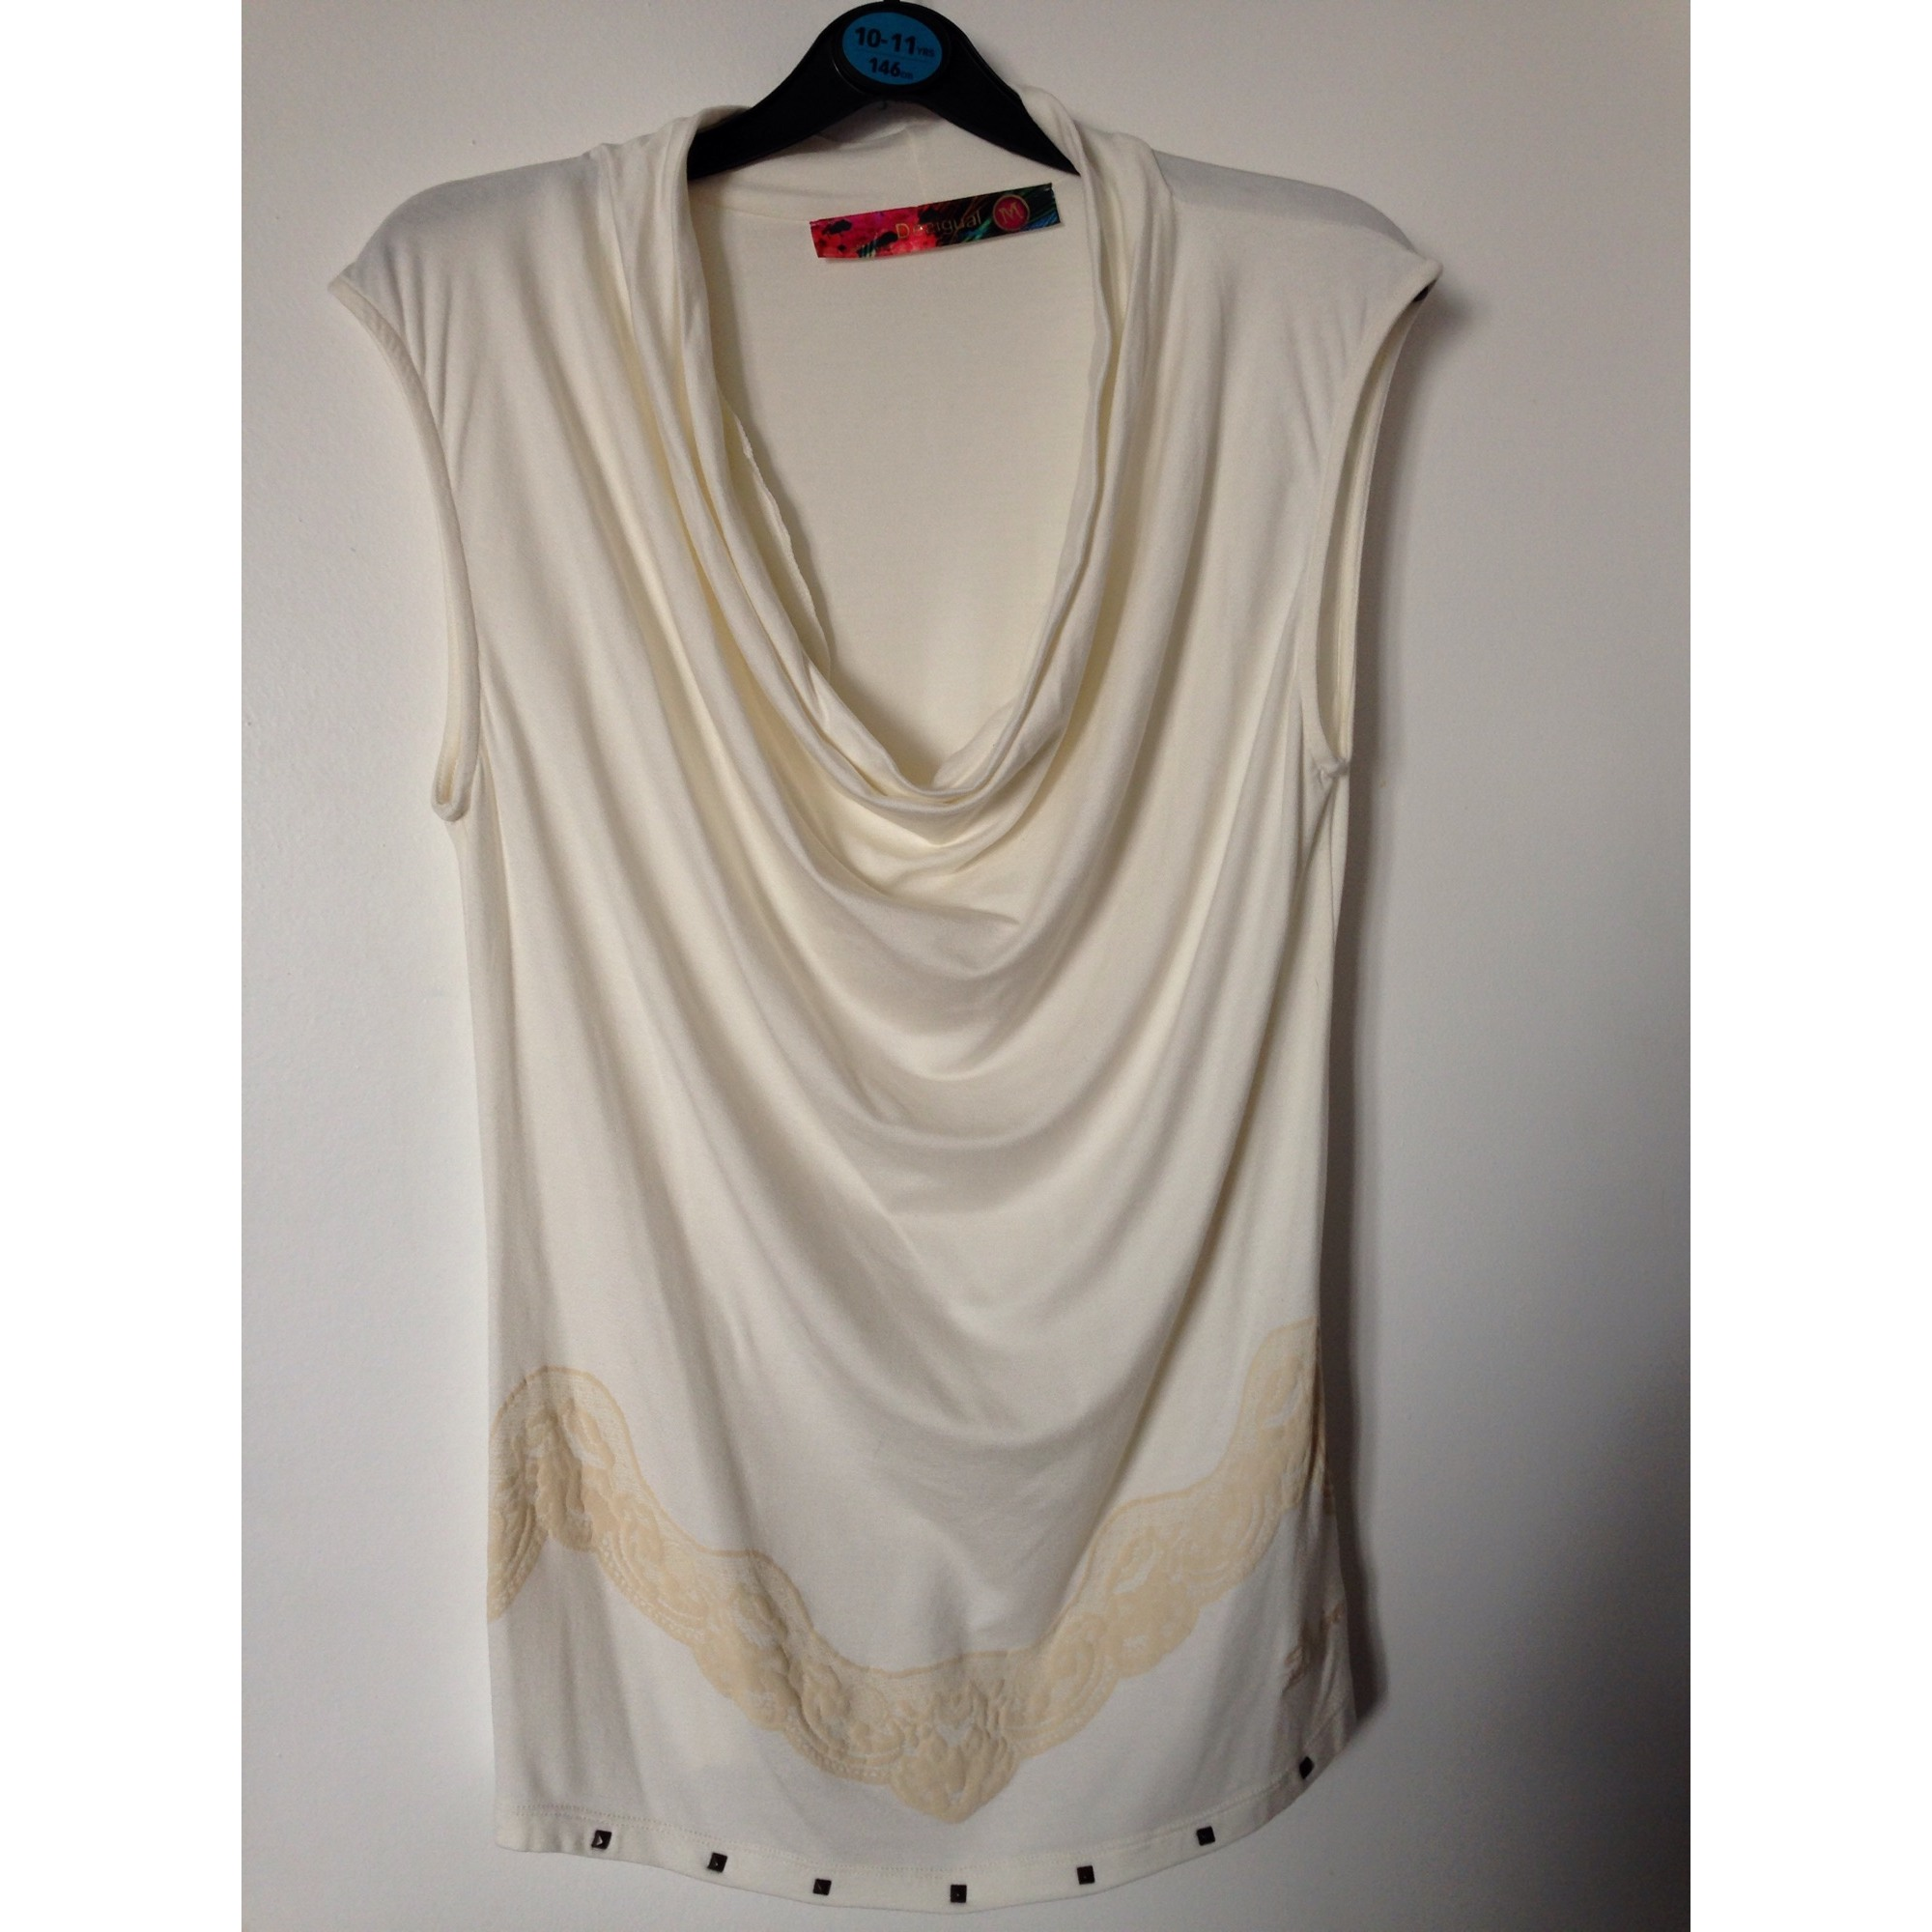 Top, tee-shirt DESIGUAL Blanc, blanc cassé, écru